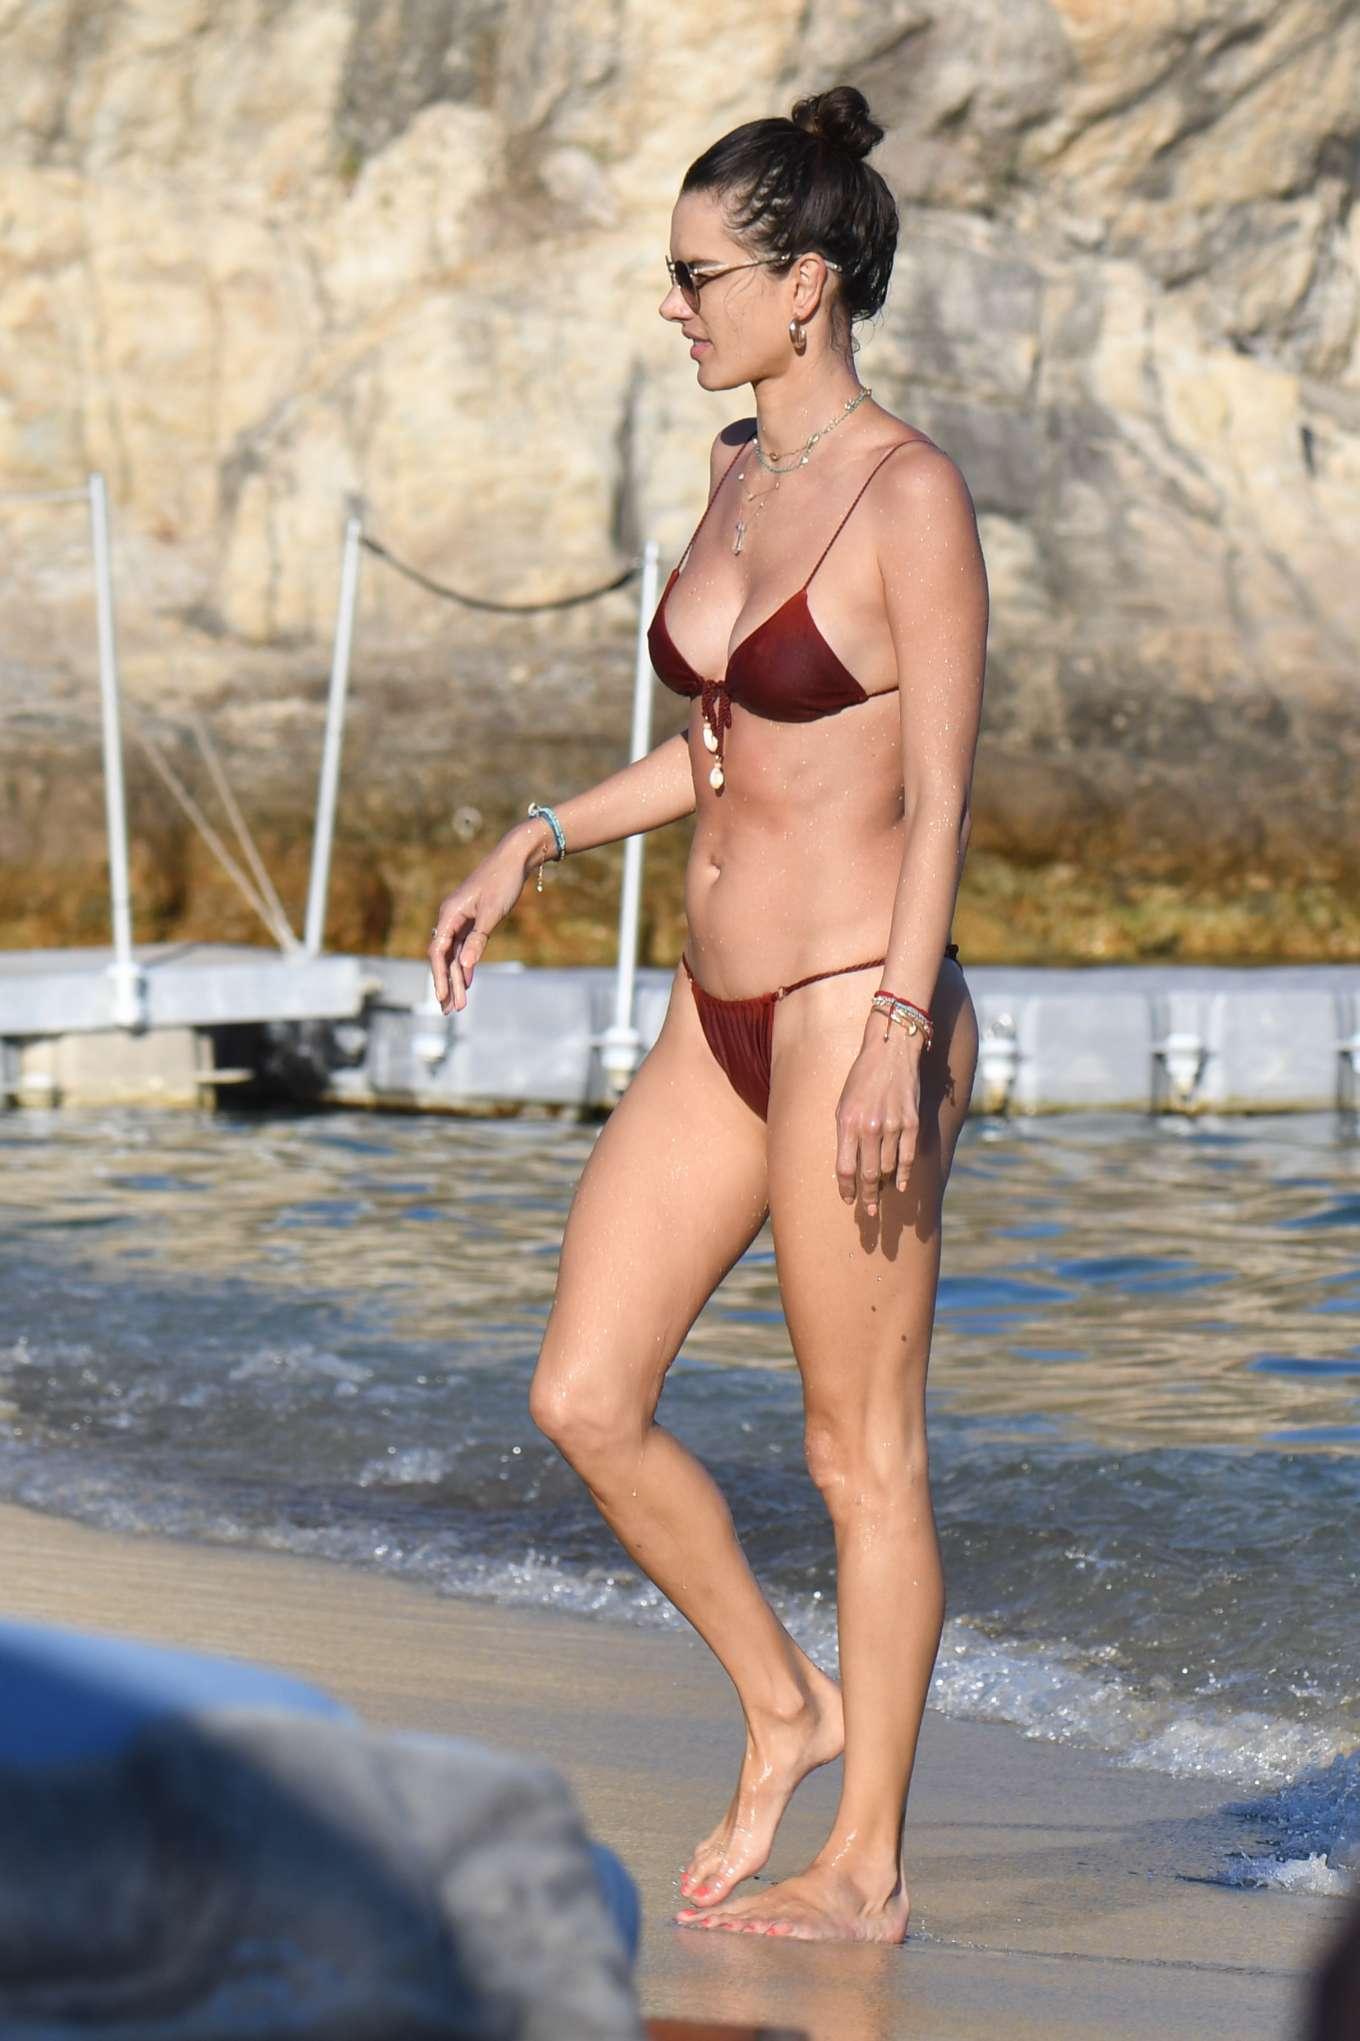 Alessandra Ambrosio in Bikini on the beach in Mykonos